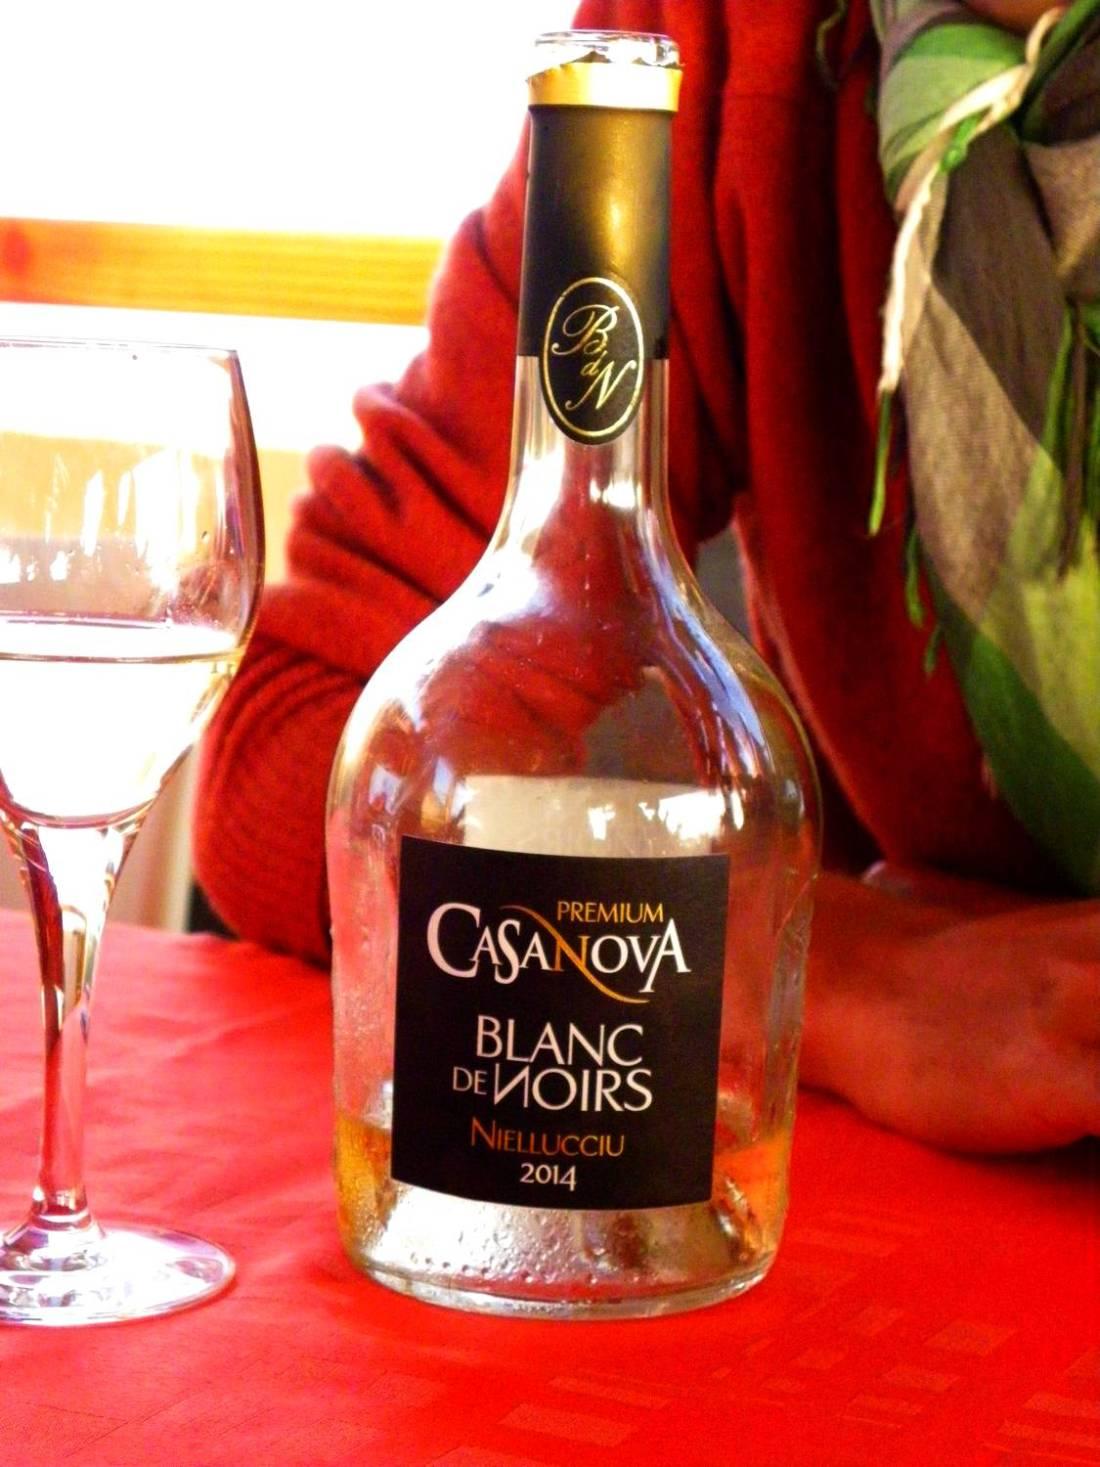 Blancs de Noirs wine bottle - Urbinu pond, Corsica